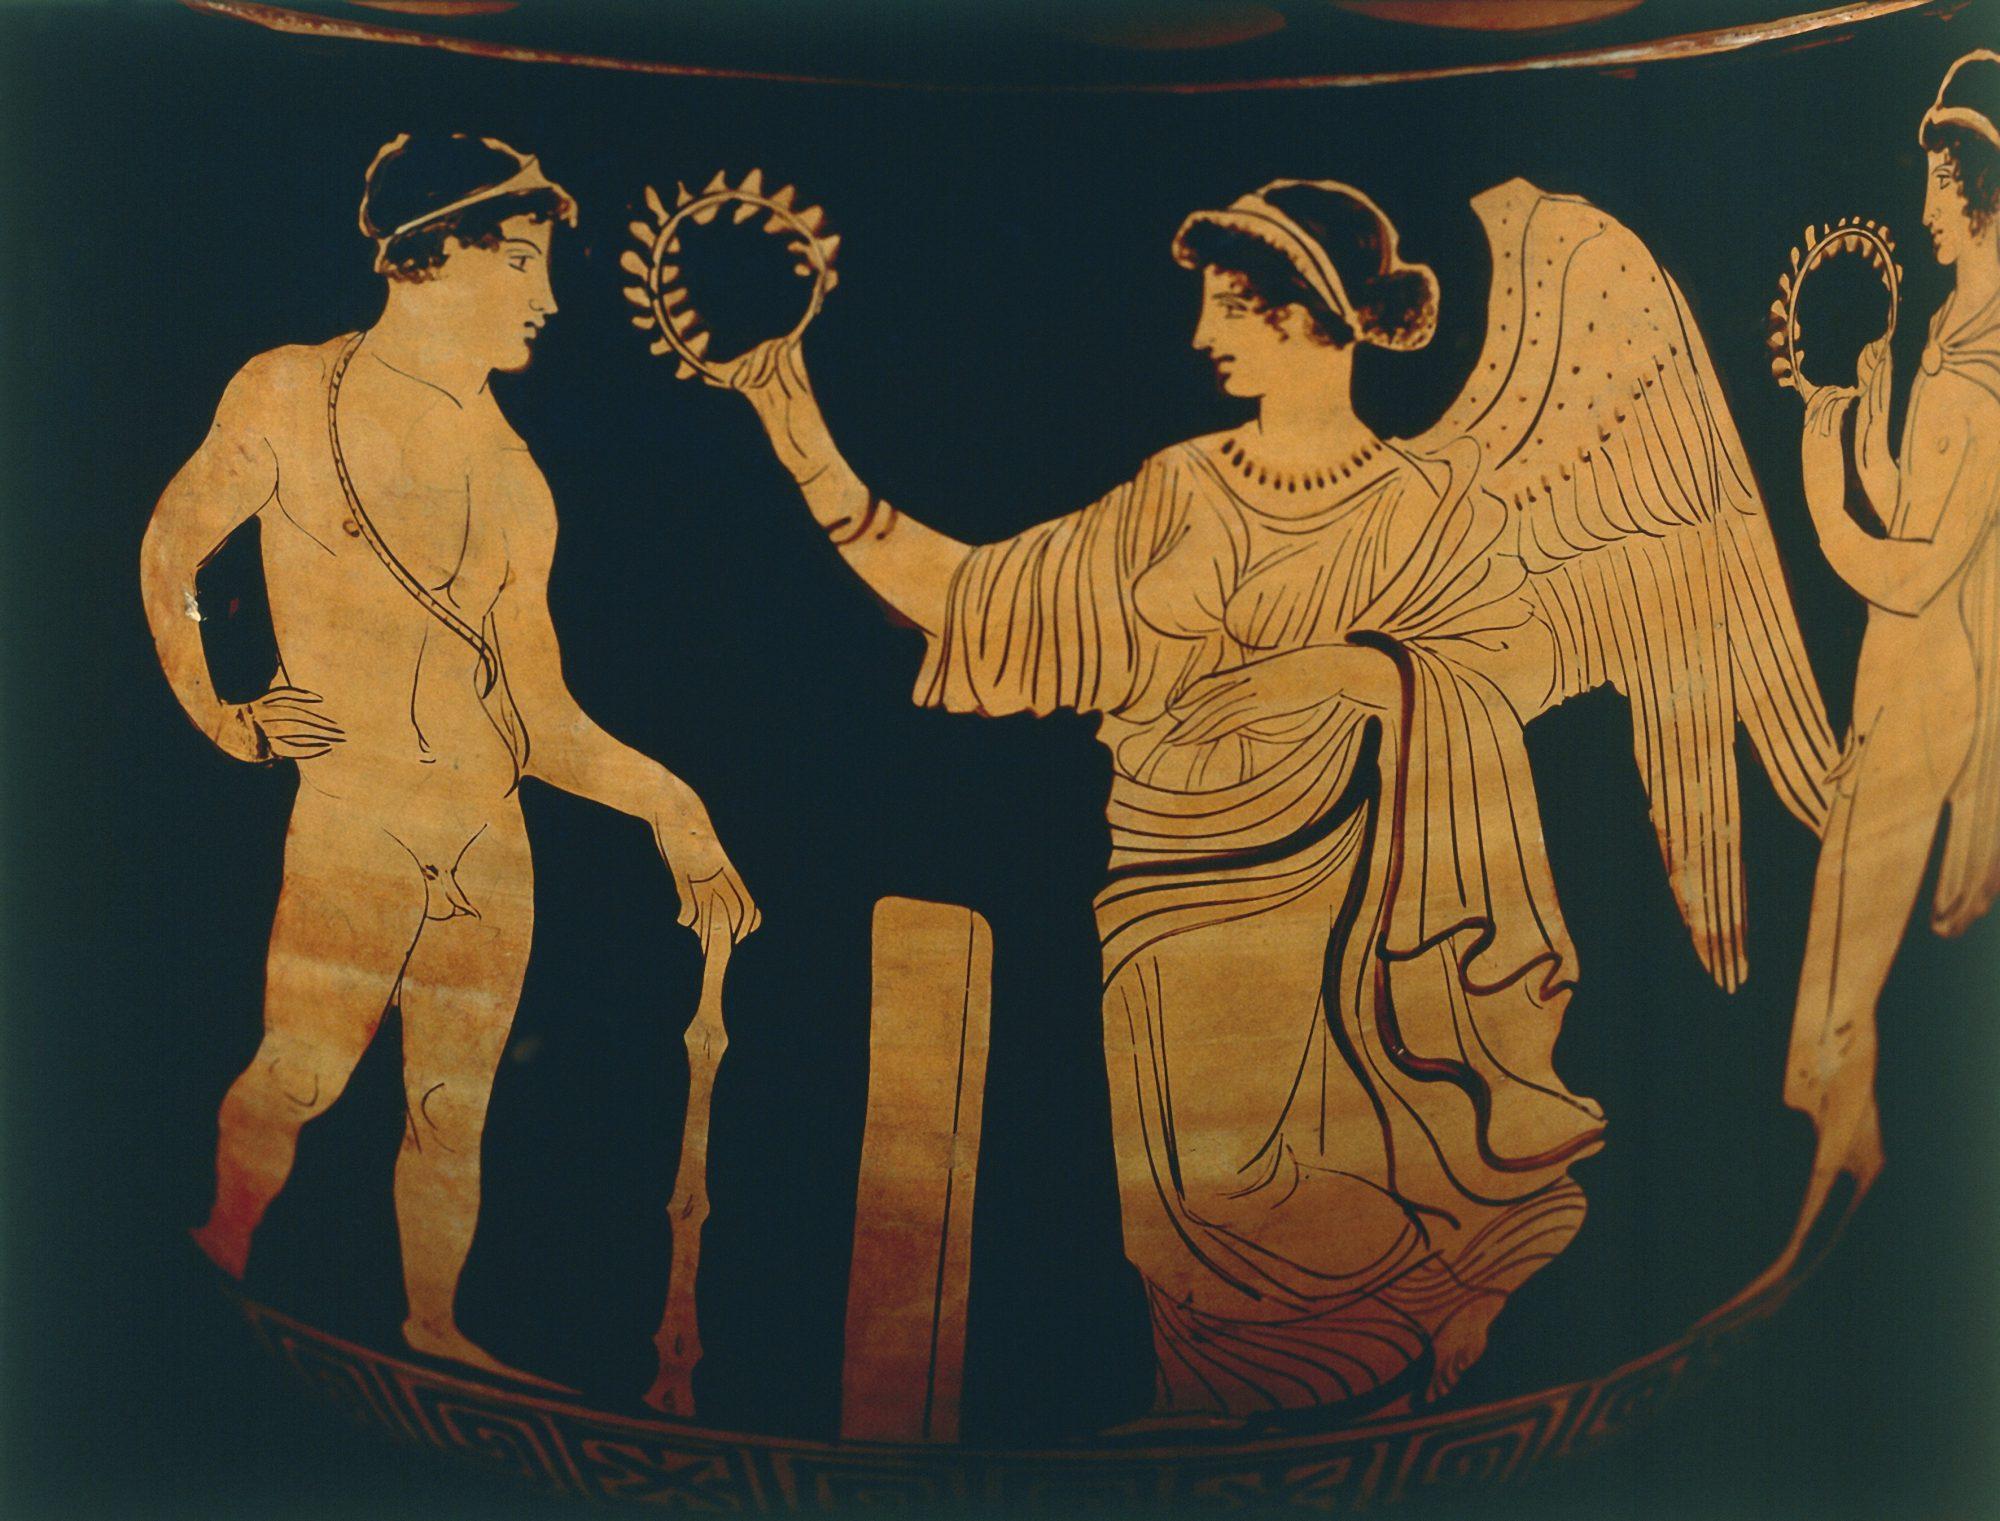 Image of ancient Greek Olympics